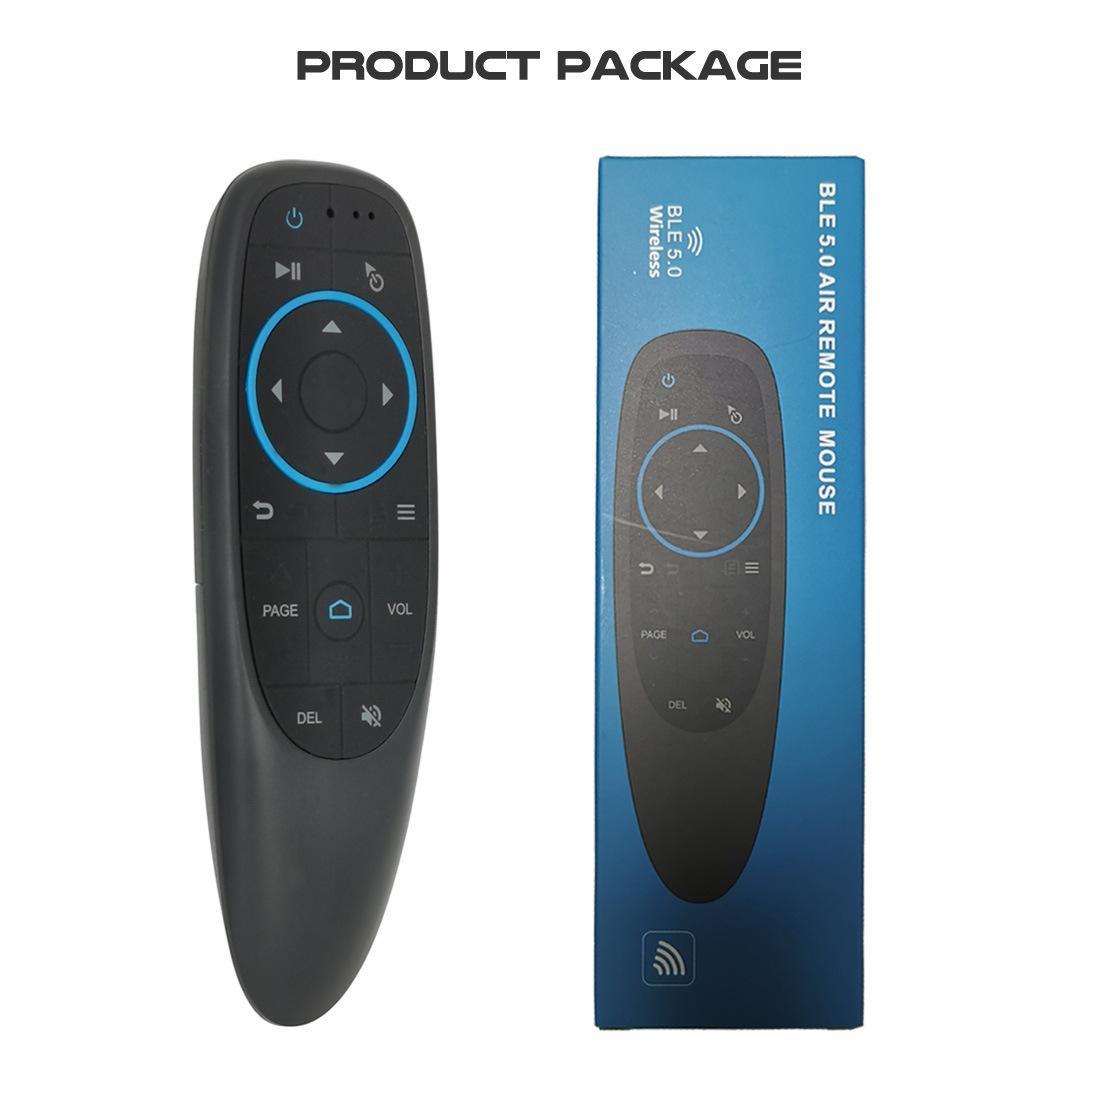 G10BTS 무선 블루투스 에어 마우스 6 축 자이로 스코프 (17) 키 스마트 원격 안드로이드 TV 박스 x96 공기에 대한 x88 프로 등